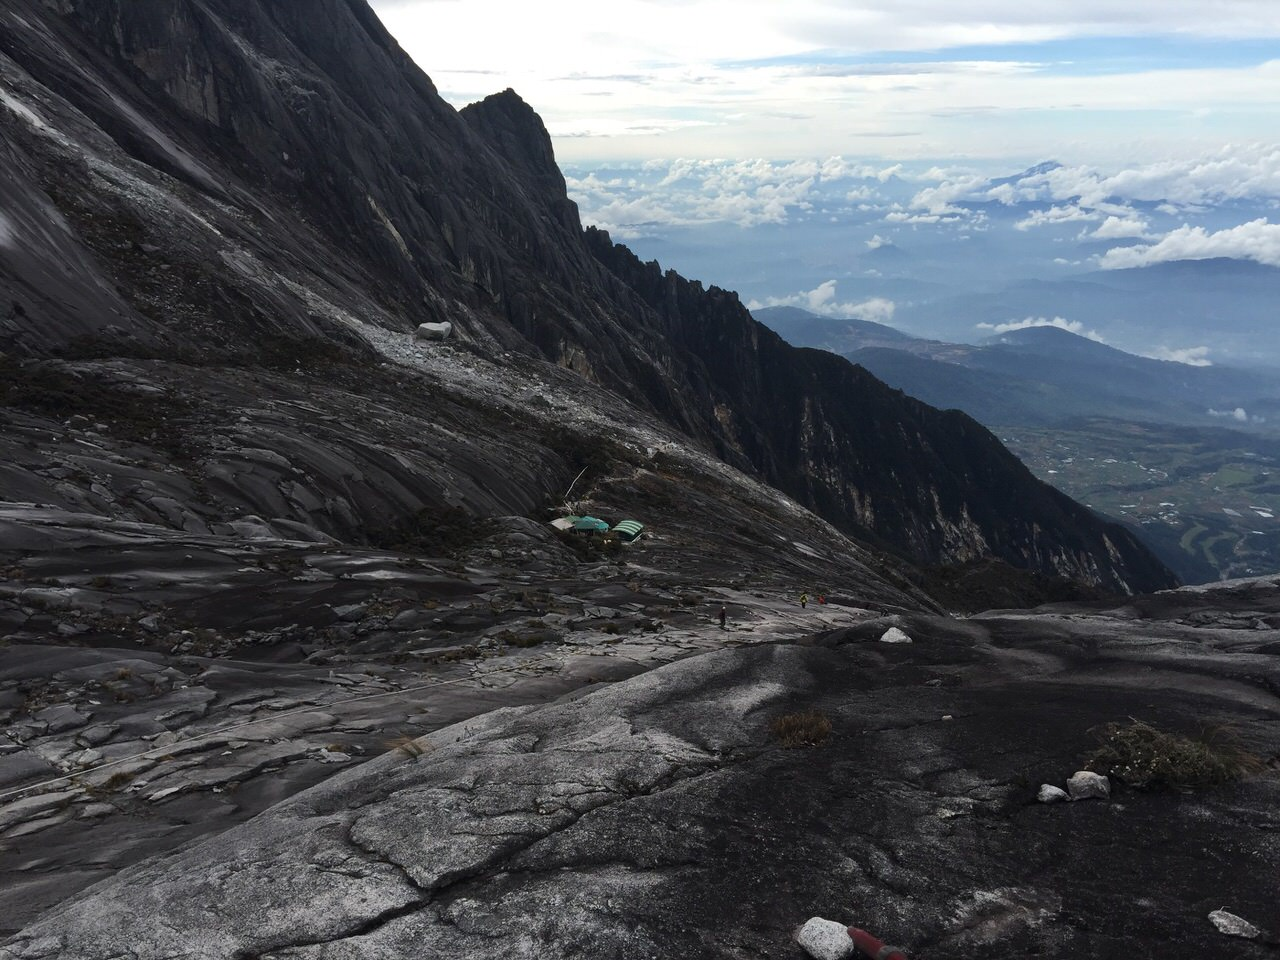 Kota Kinabalu climbing 4180